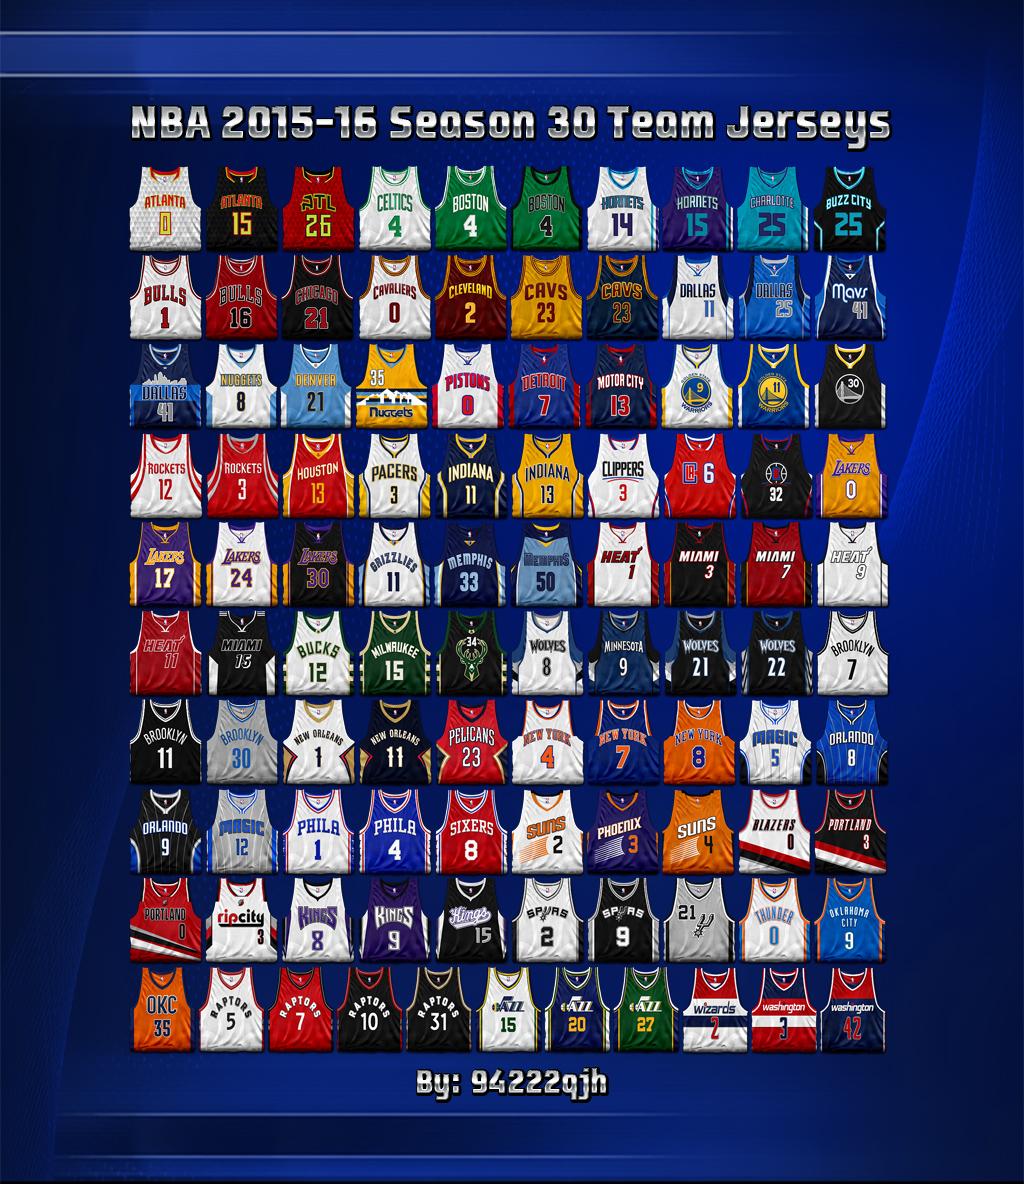 All Team Of The Seasons: NBA 2015/2016 Season 30 Teams